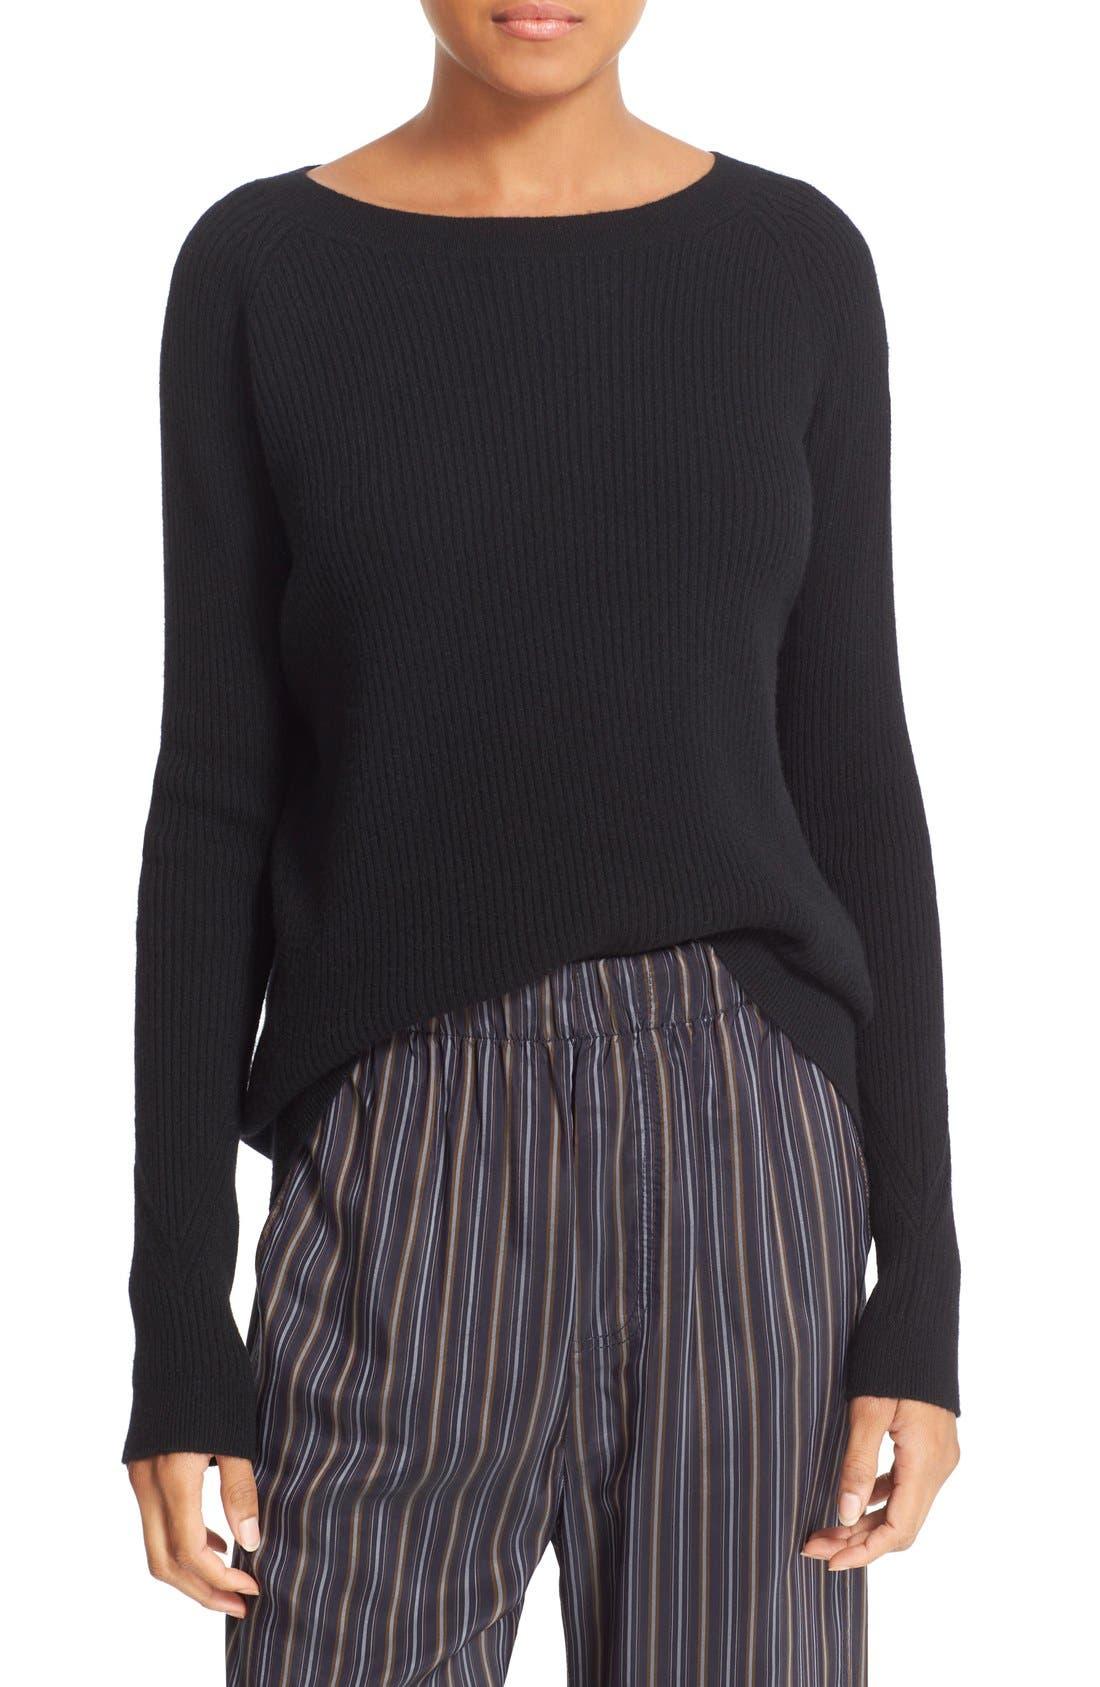 VINCE, Rib Knit Raglan Sleeve Cashmere Sweater, Main thumbnail 1, color, 001